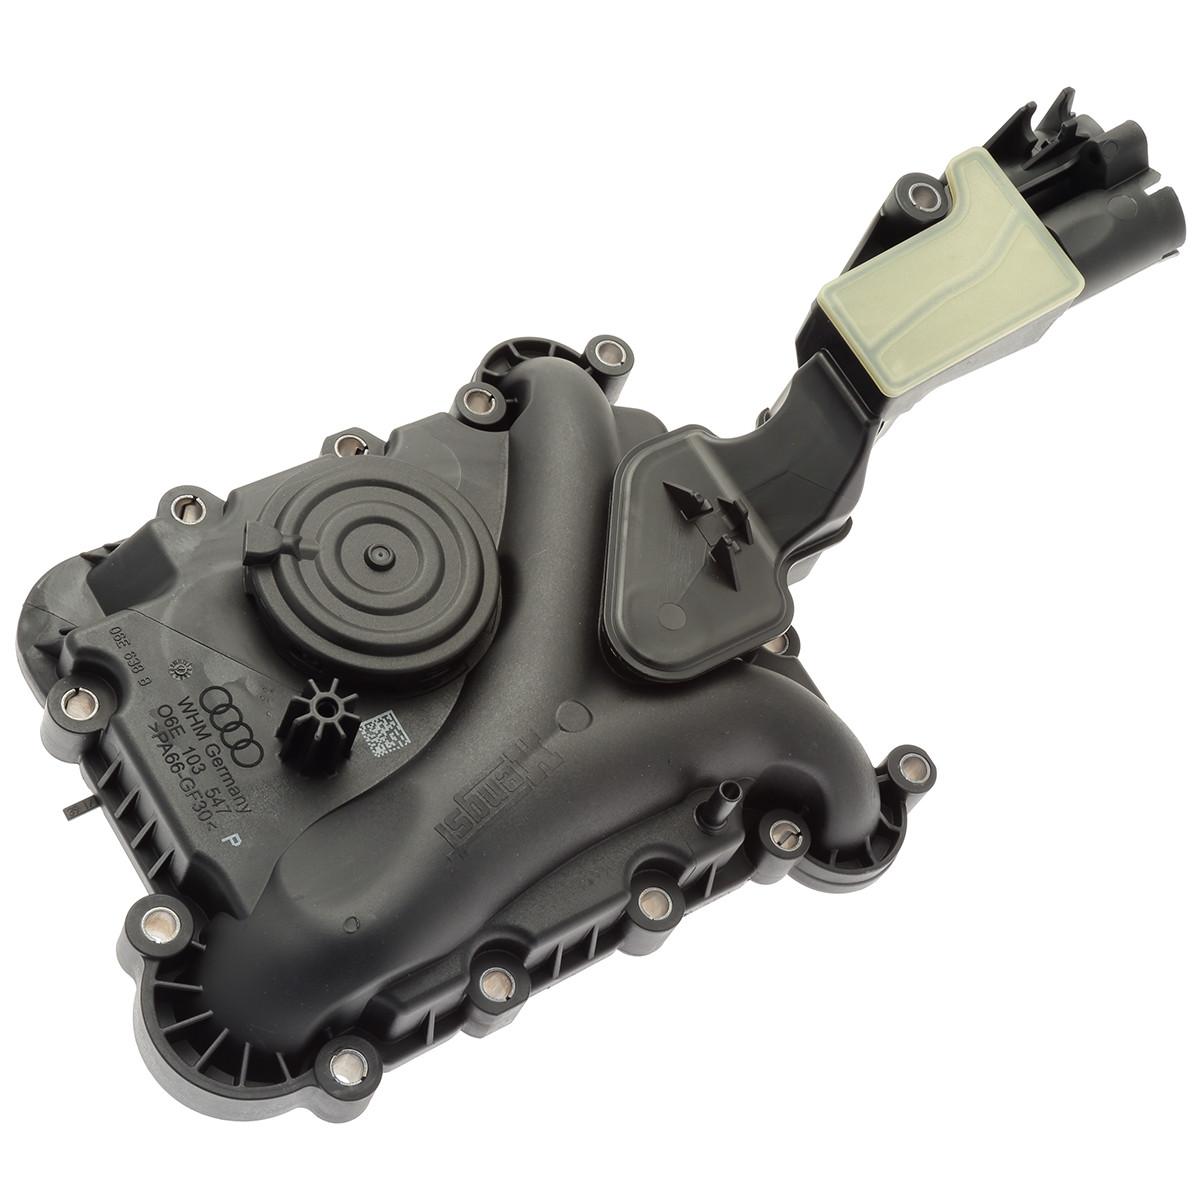 For 2005-2011 Audi A6 Quattro Emission Check Valve 99875HG 2006 2007 2008 2009